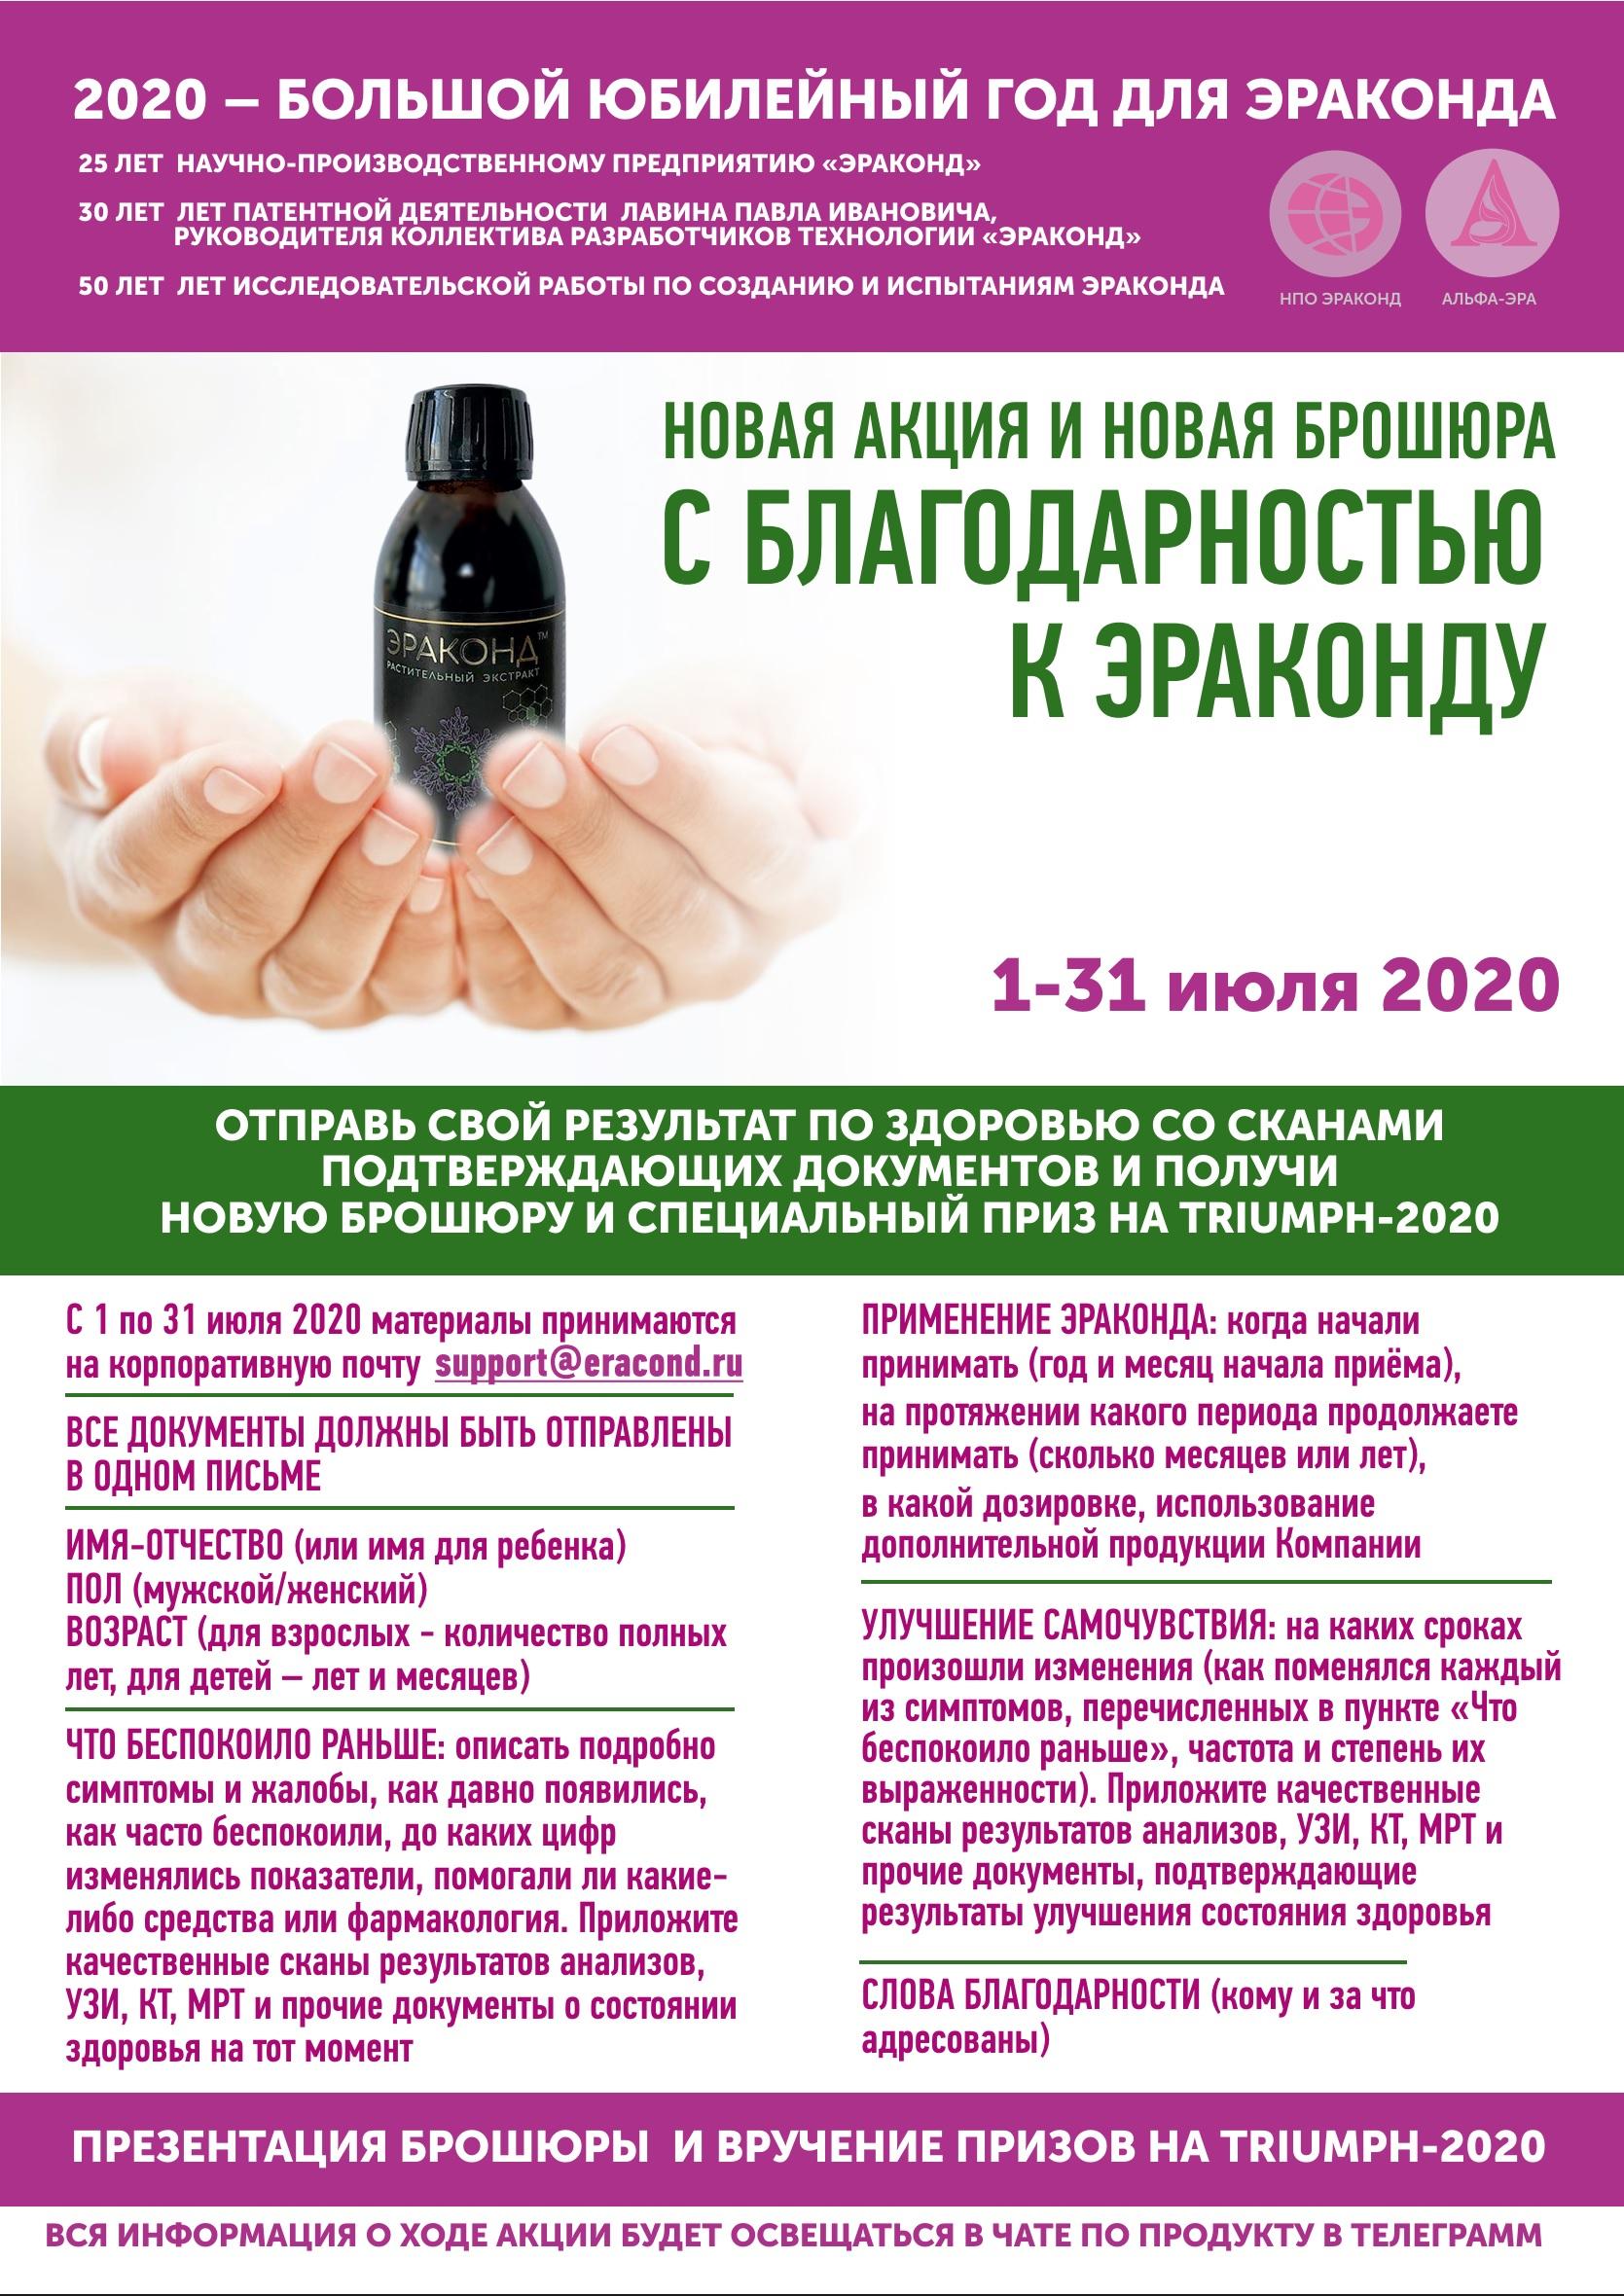 Плакат С БЛАГОДАРНОСТЬЮ К ЭРАКОНДУ